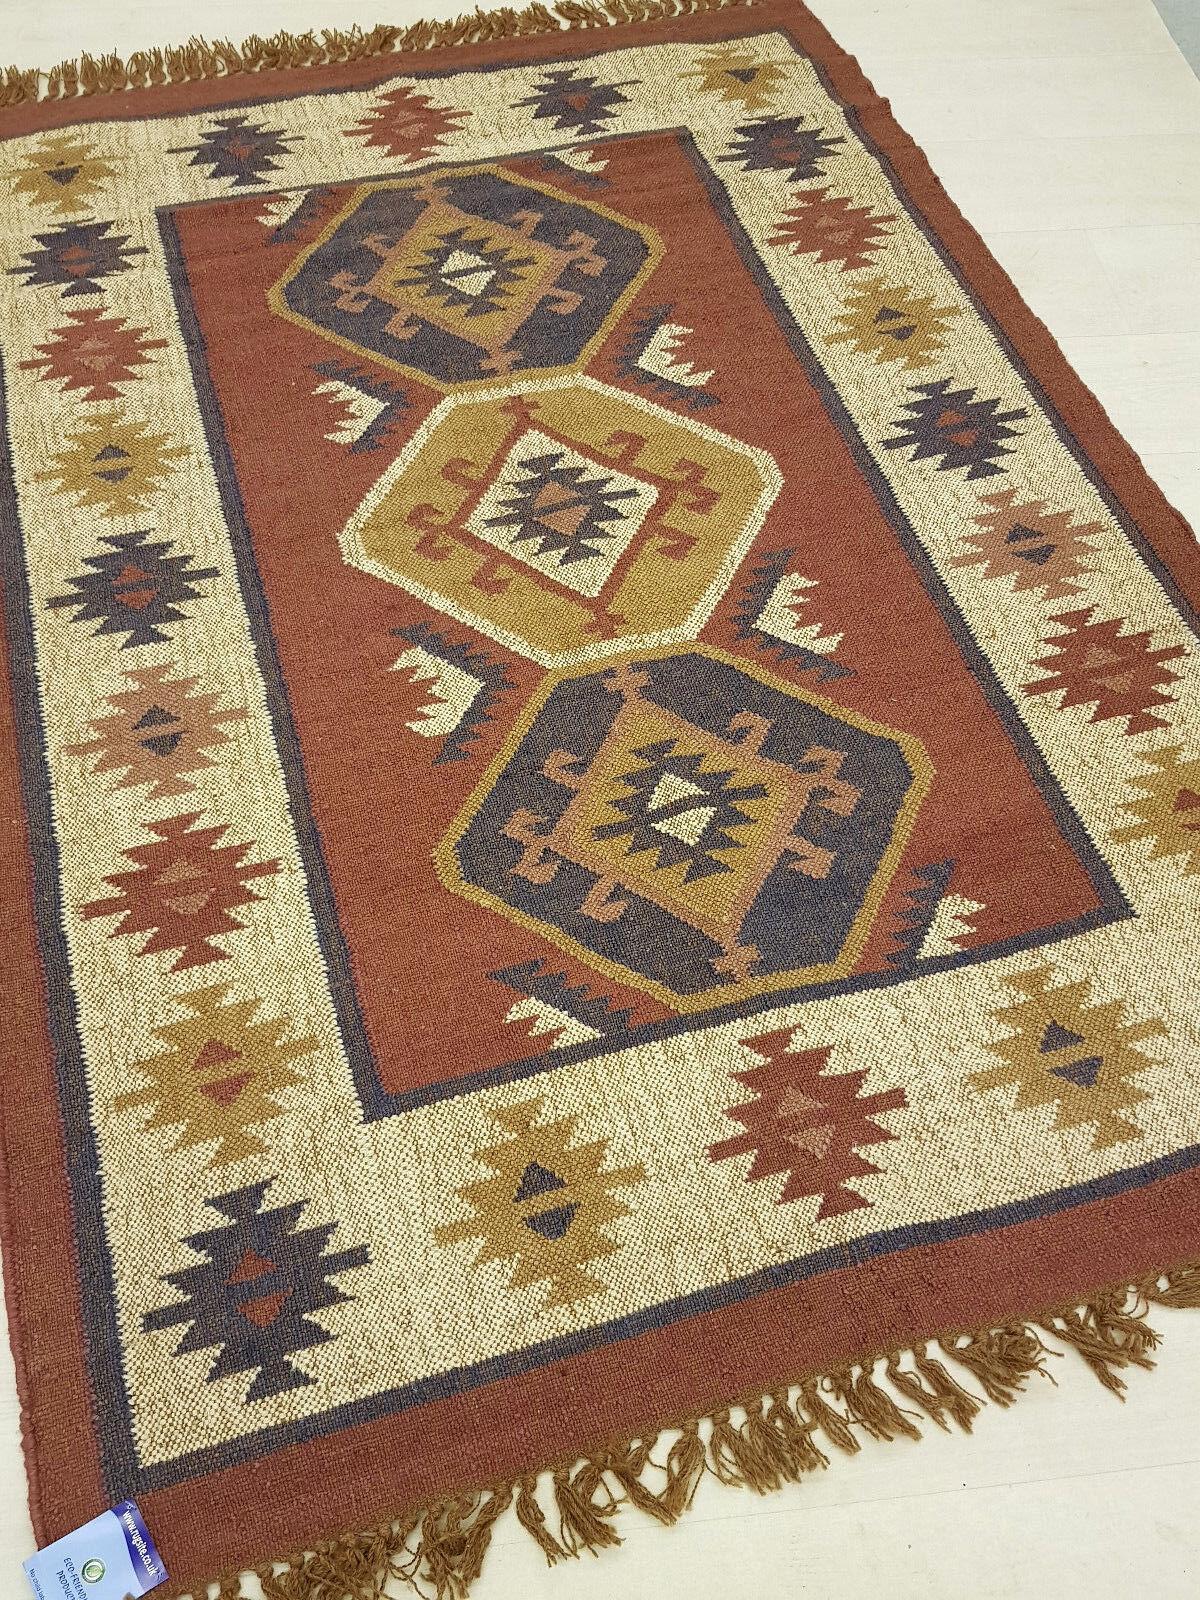 Jute Wool Kilim Rust Beige Blau 120x180cm Quality Hand Hand Hand Made Reversible rug c172b7